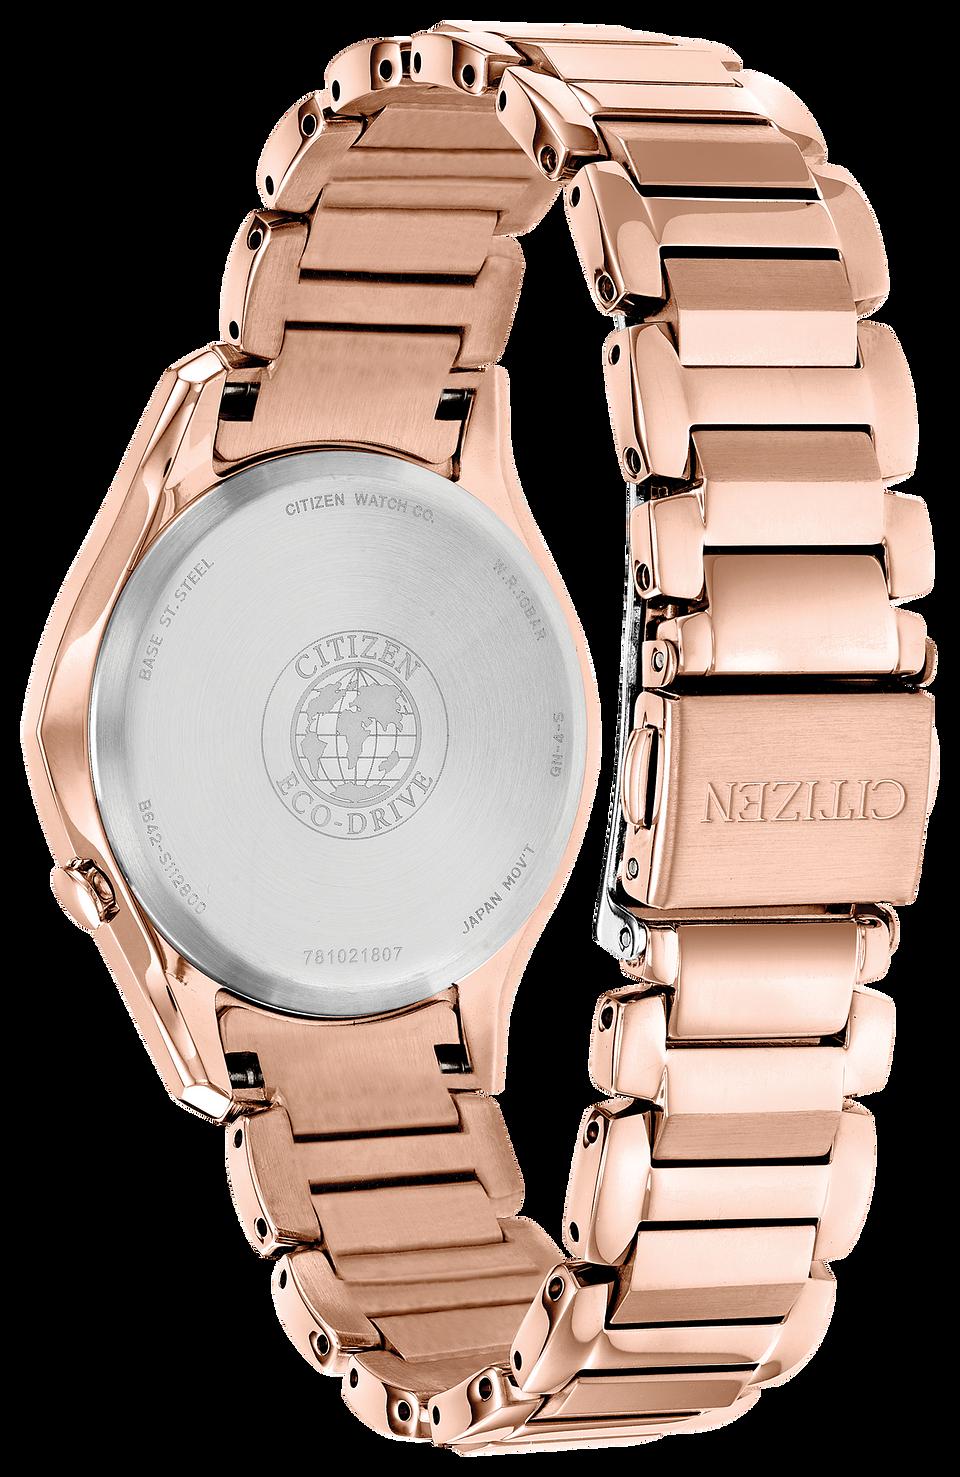 de9bff9ecd2907 Modena - Ladies Eco-Drive EM0593-56A Pink Steel Watch   Citizen